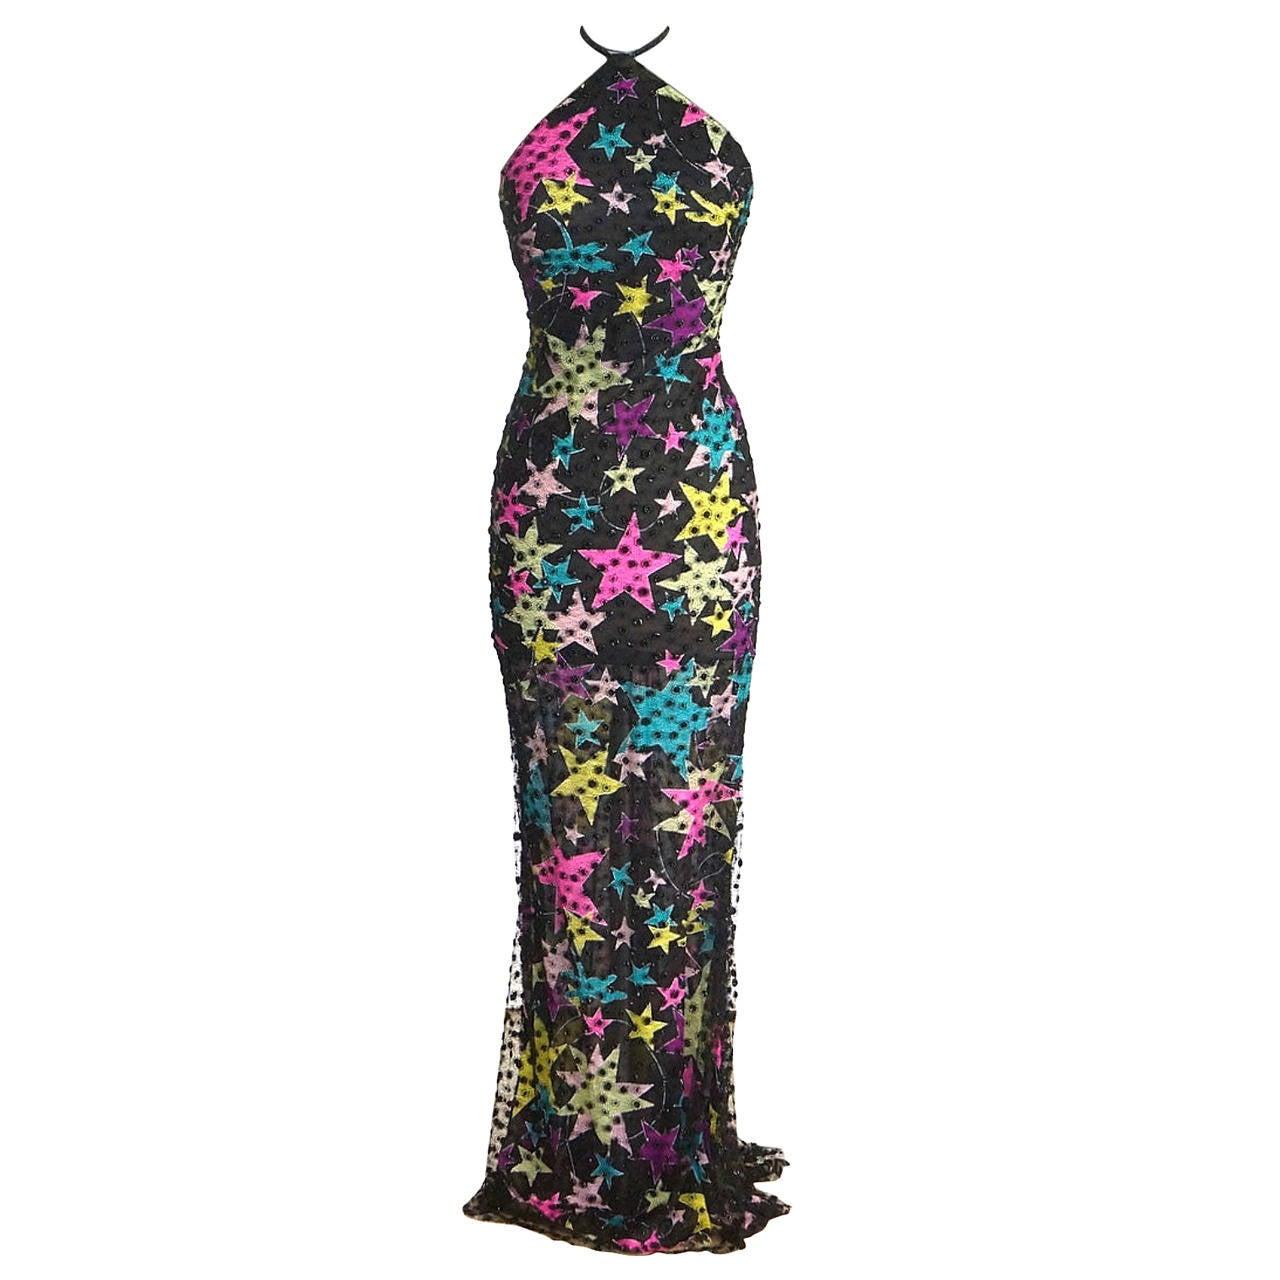 GIANNI VERSACE Couture Vintage halter dress 1990s' VIBRANT 40 / 4  For Sale